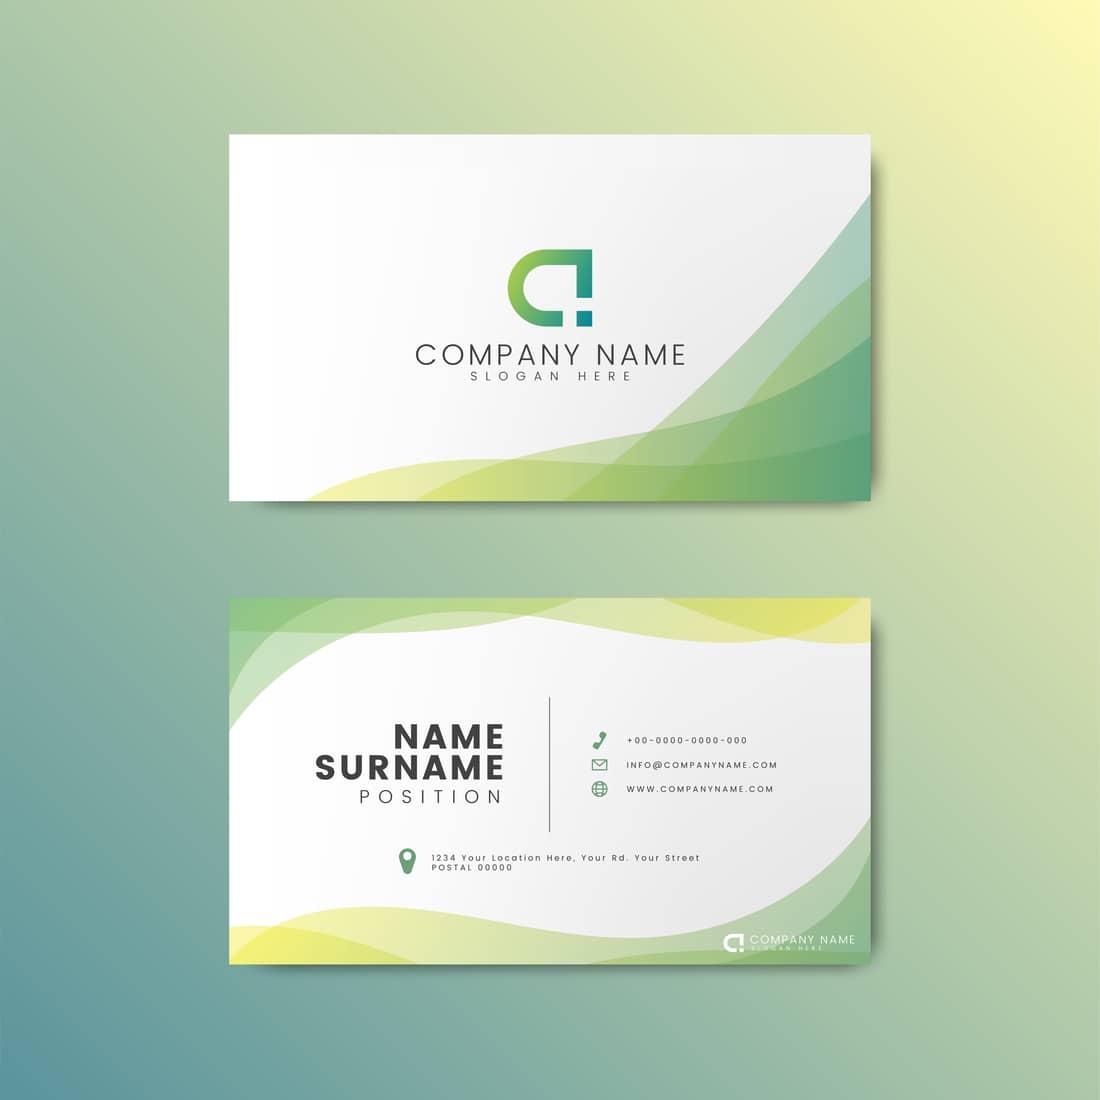 D company Card